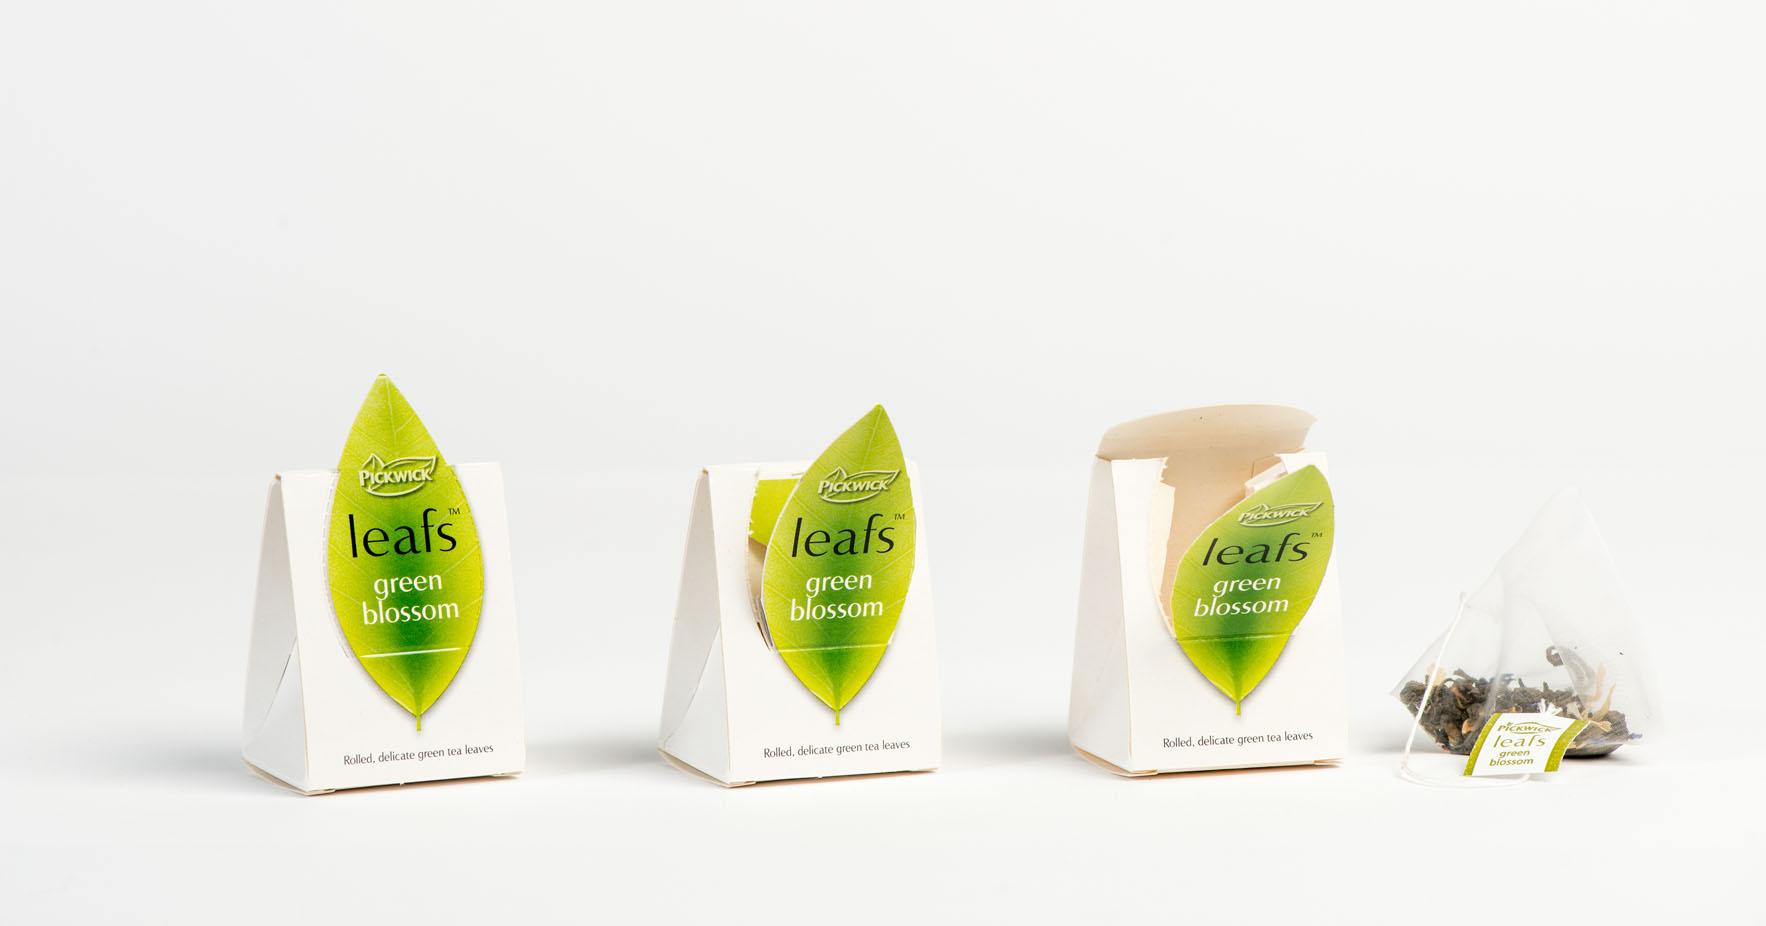 ritual-opening-tea-leaves-packaging-pickwick